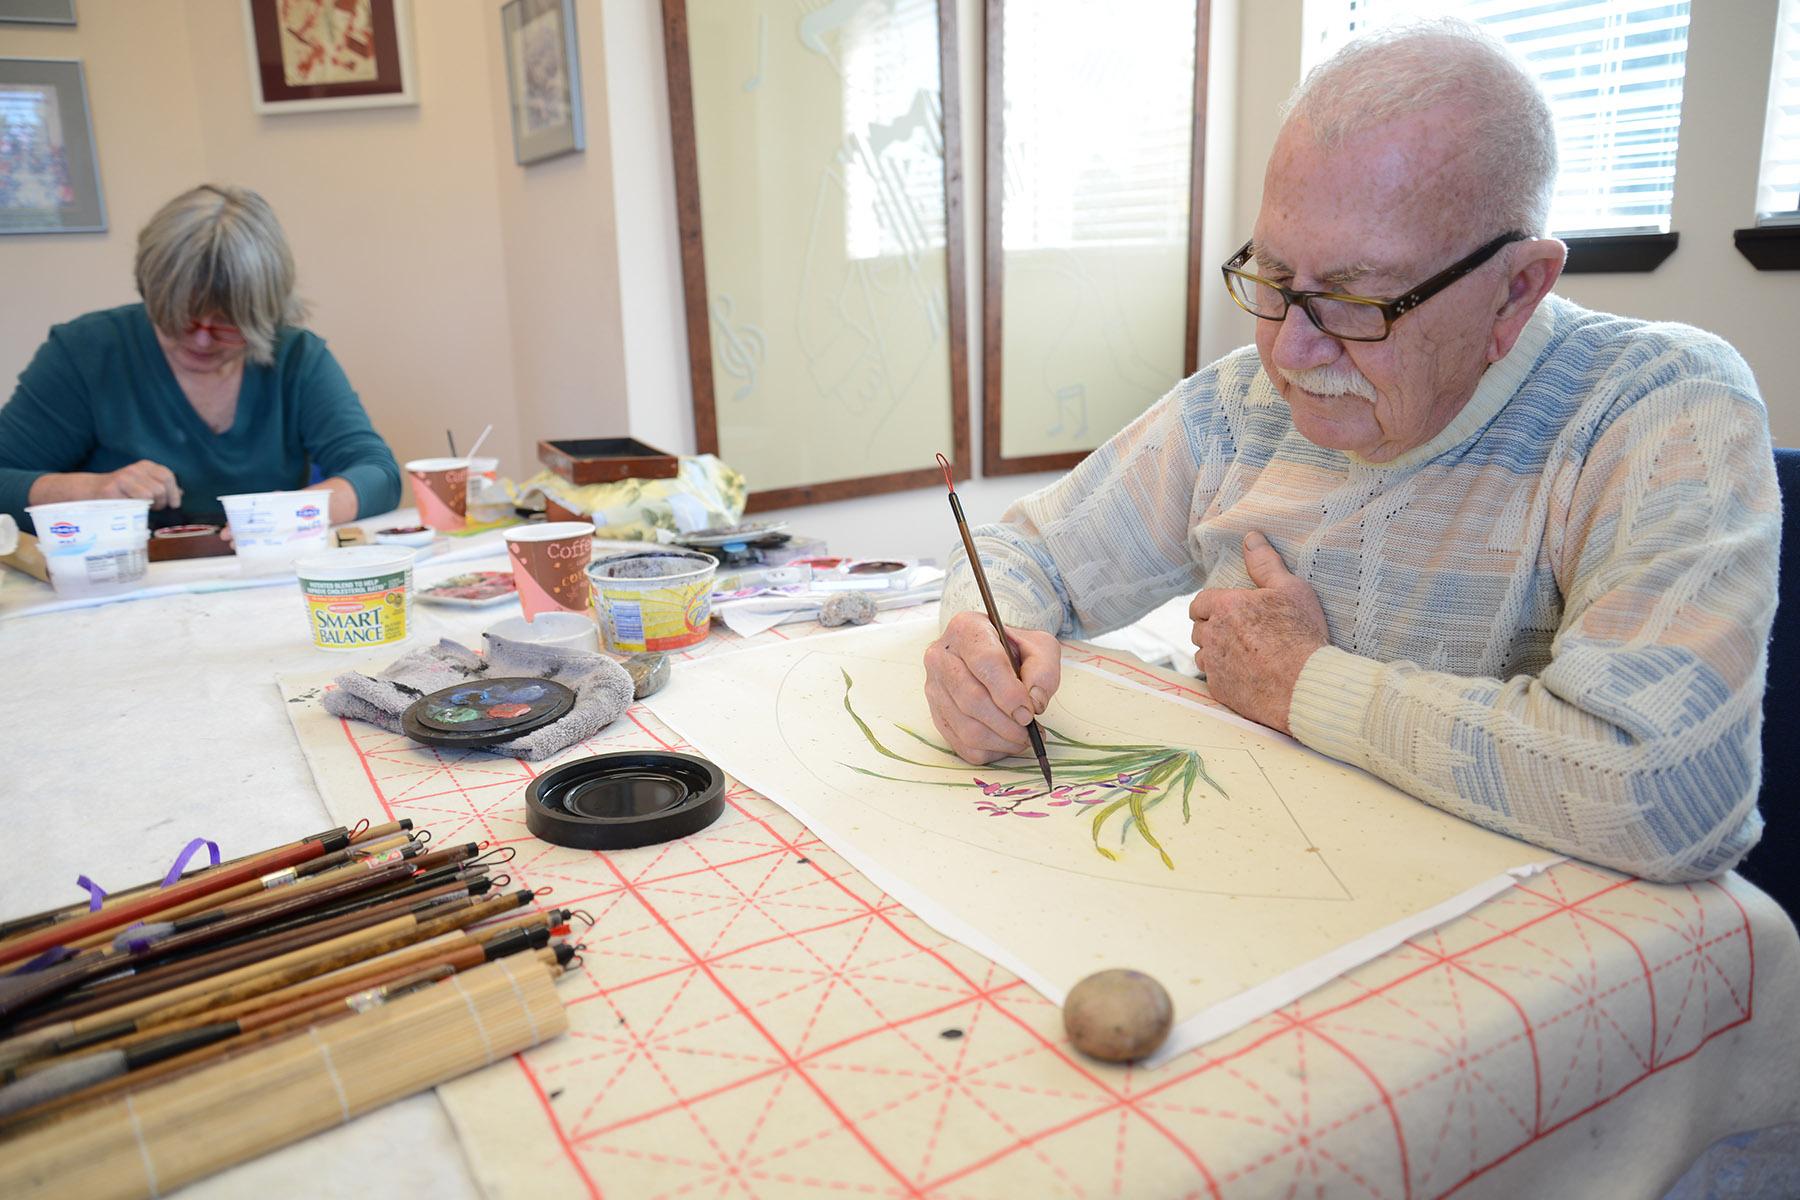 Healthy Activities for Seniors